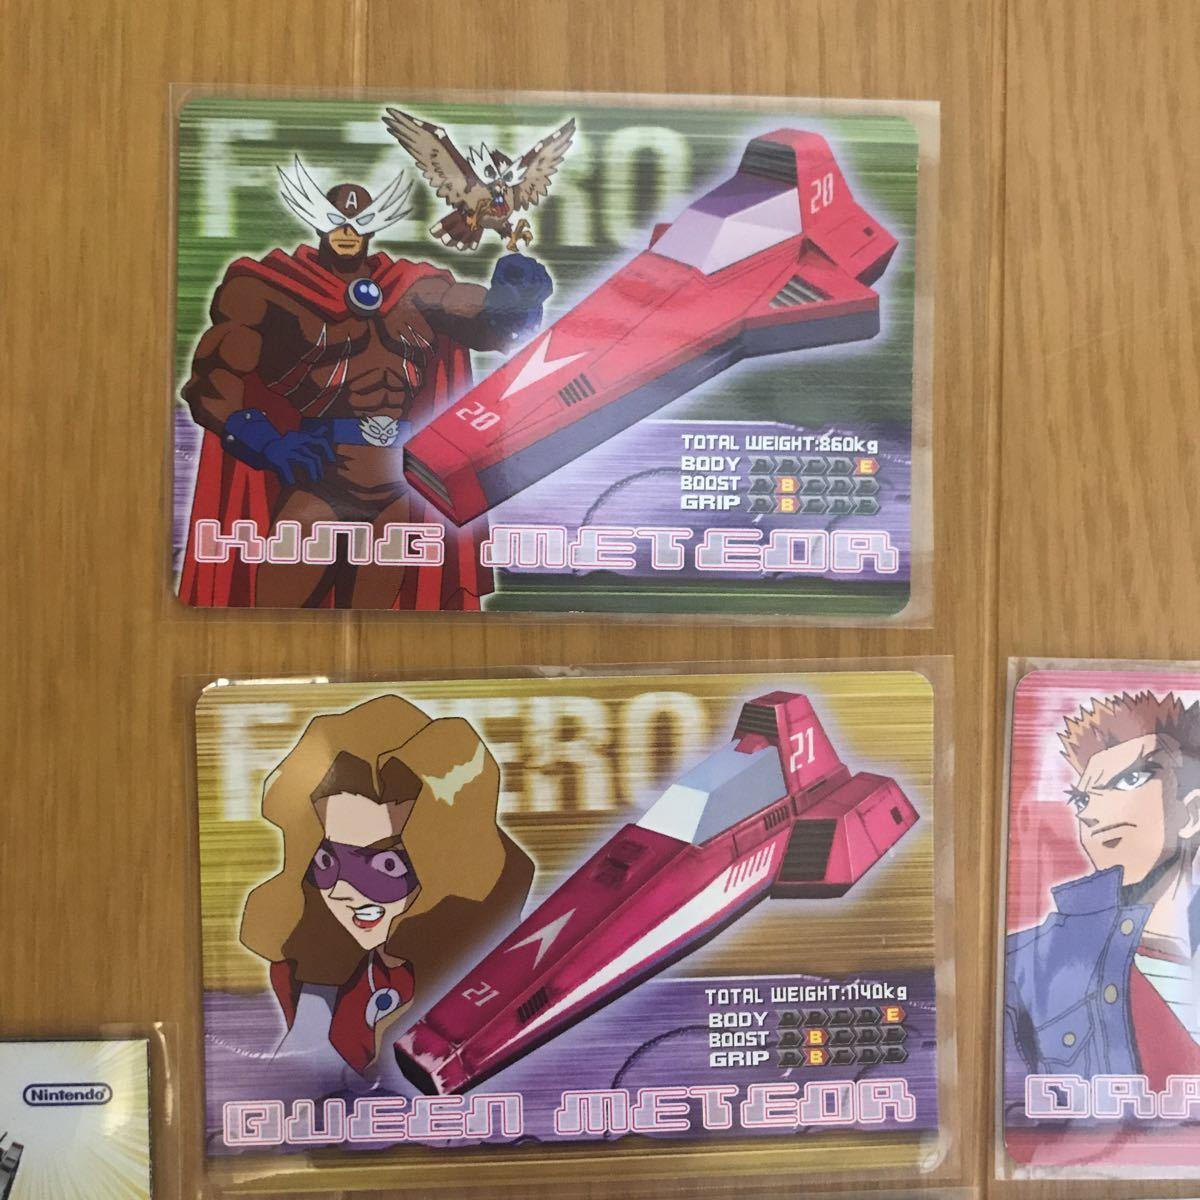 GBA  F-ZERO ファルコン伝説 &【希少】7枚 カードダス版 2枚有り☆ファルコン伝説カードe+ トレカ カード 任天堂 キャプテンファルコン_画像2